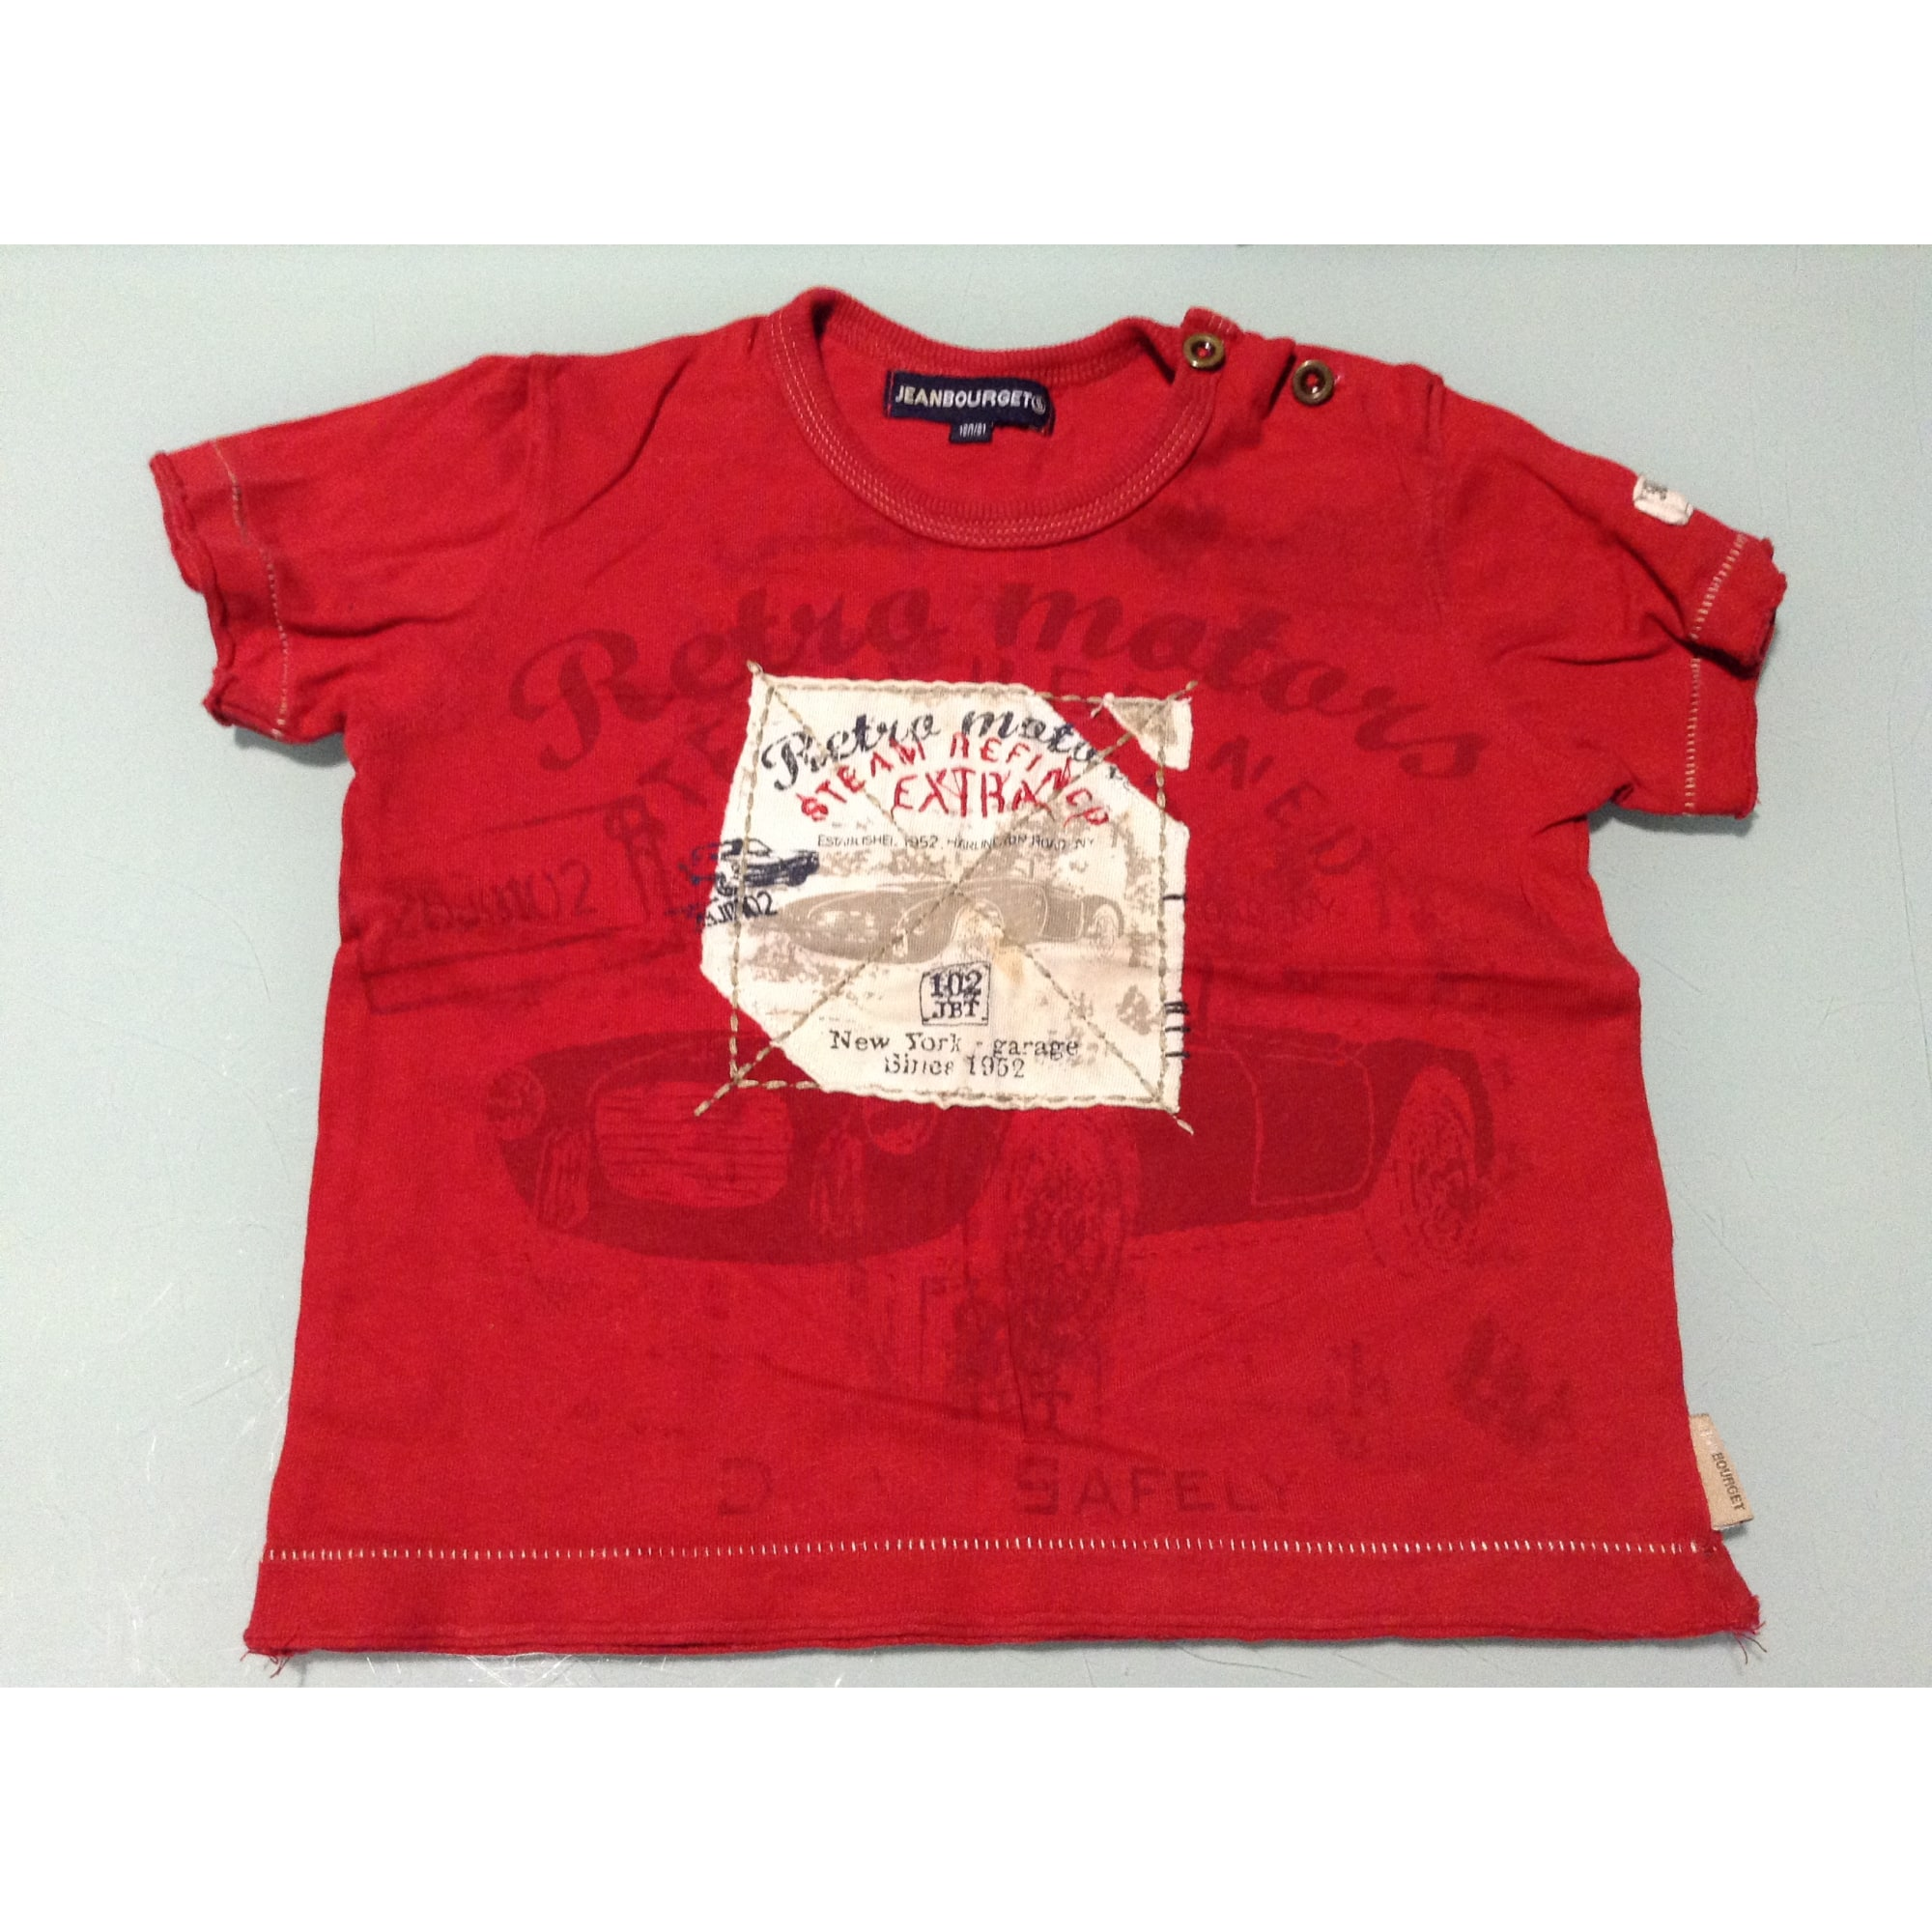 Top, tee shirt JEAN BOURGET Rouge, bordeaux